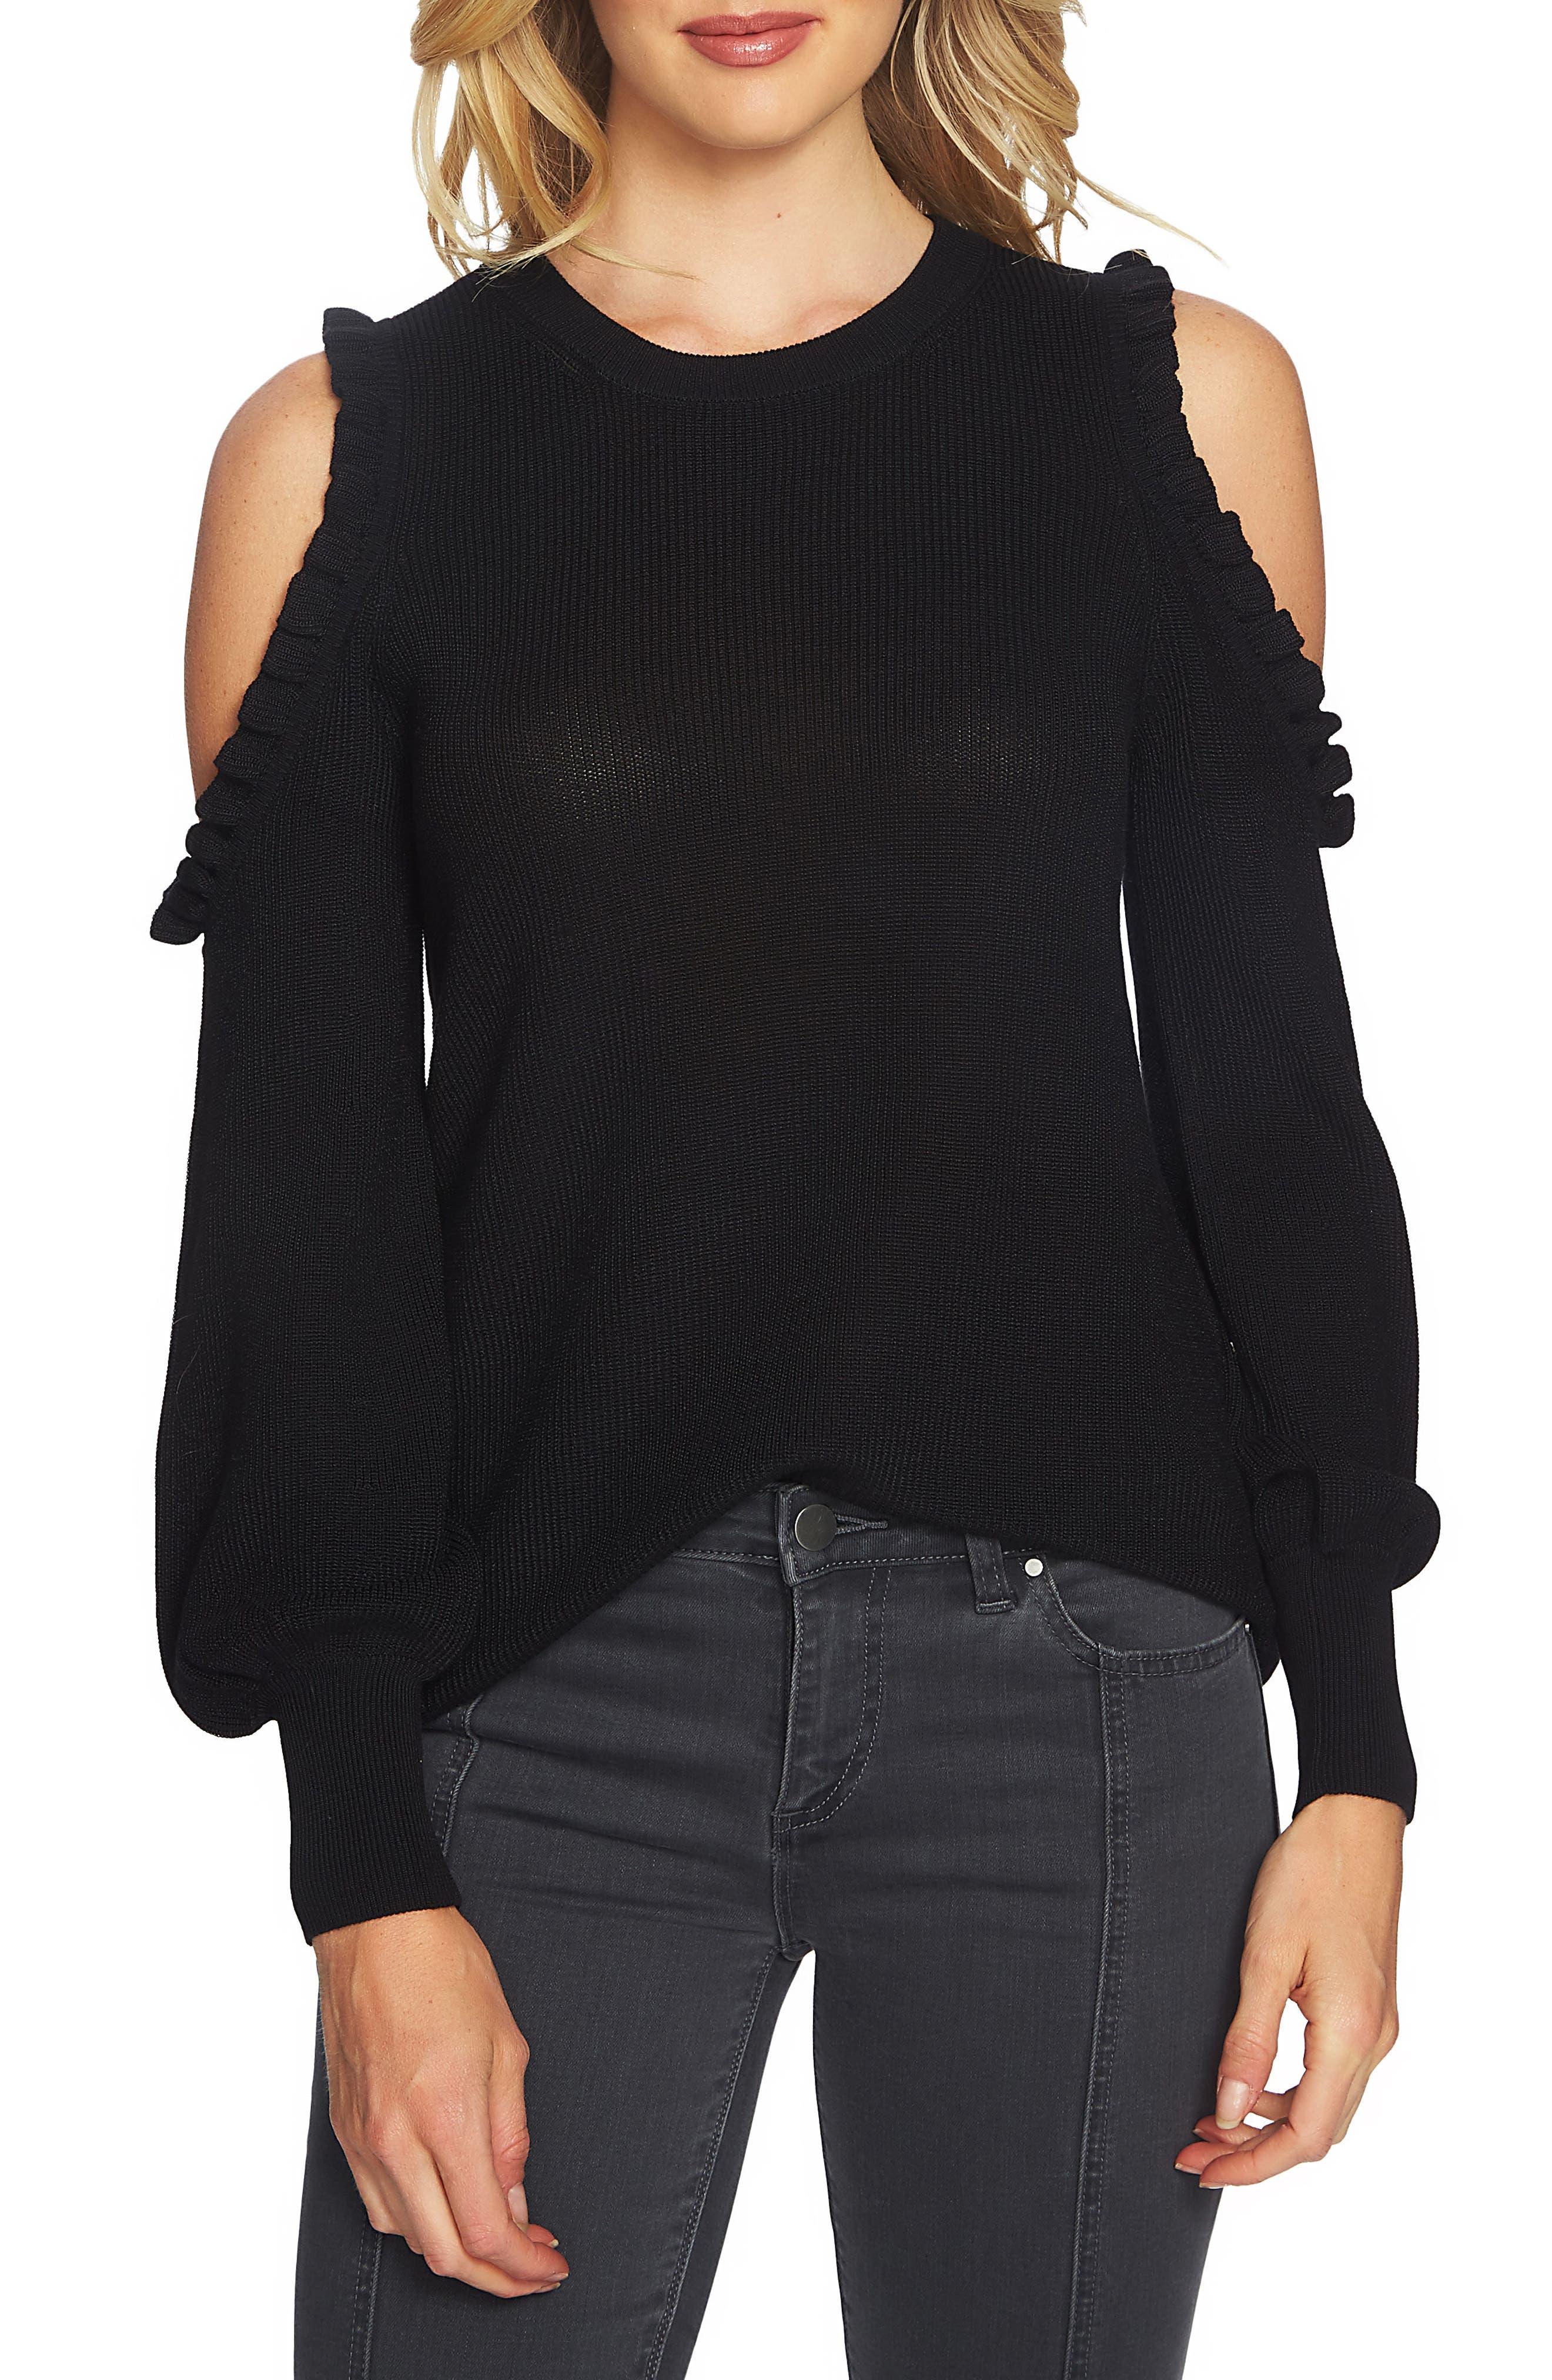 Alternate Image 1 Selected - 1.STATE Cold Shoulder Sweater